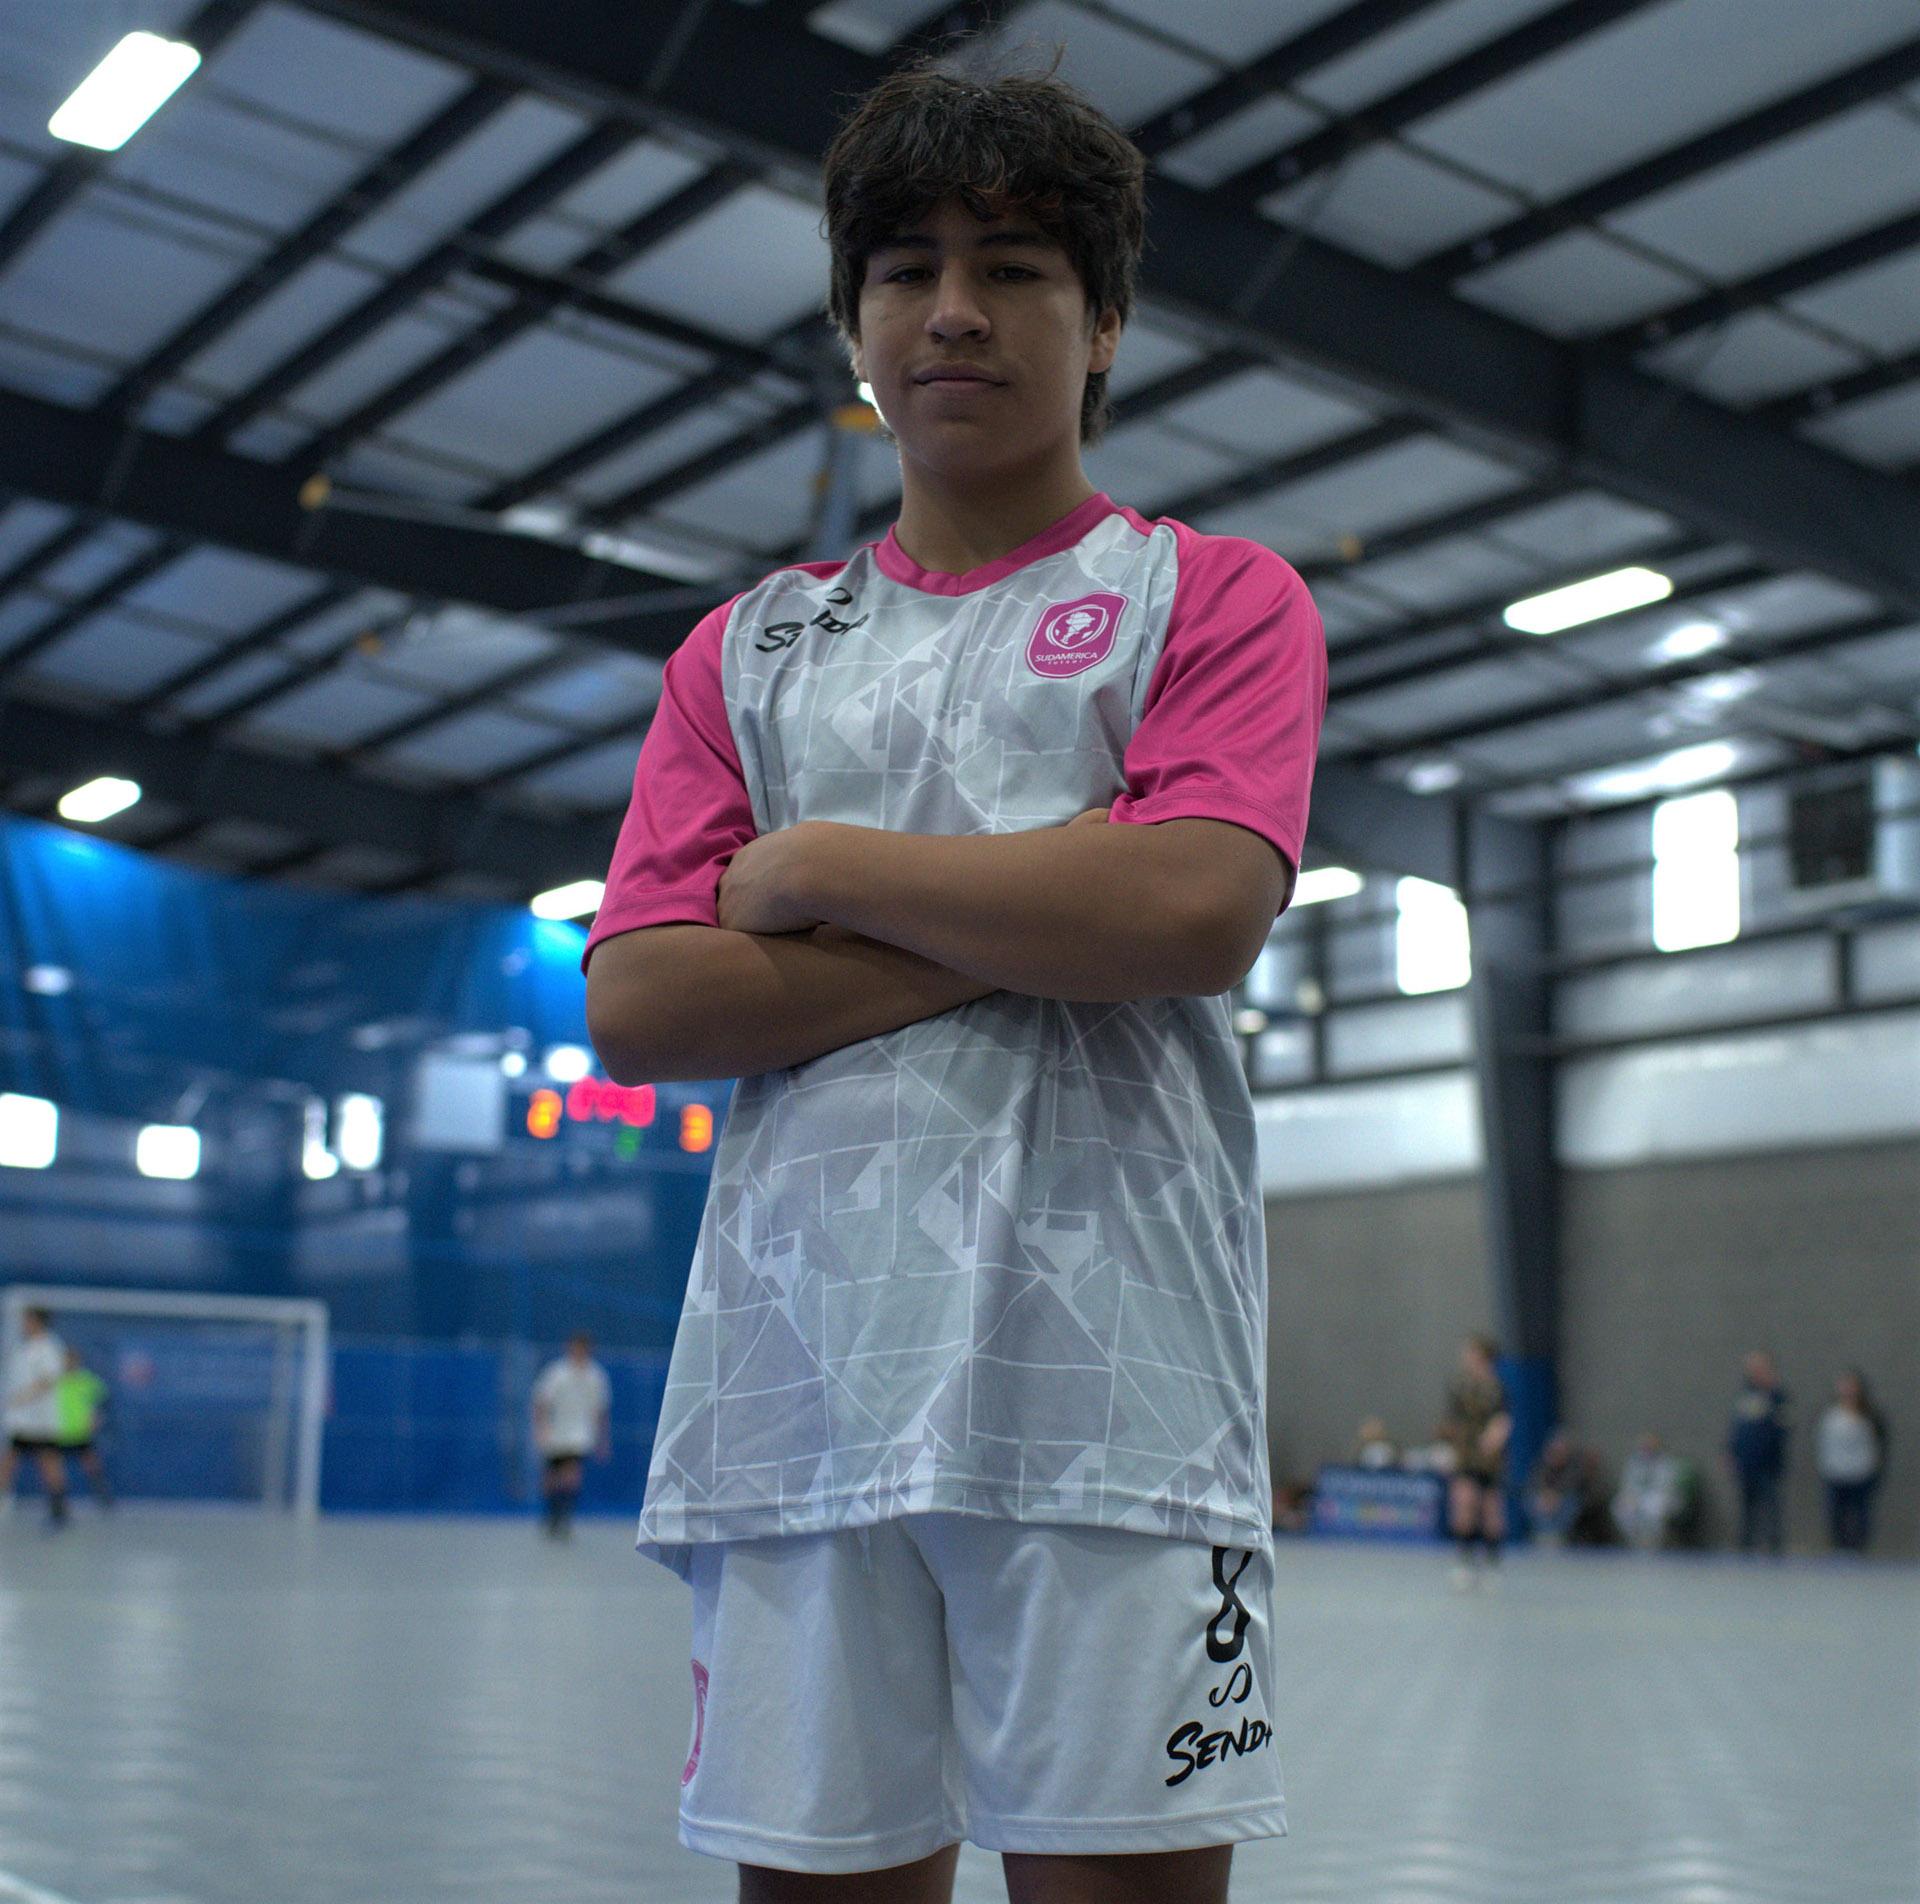 Sudamerica's player with Senda customized away uniform